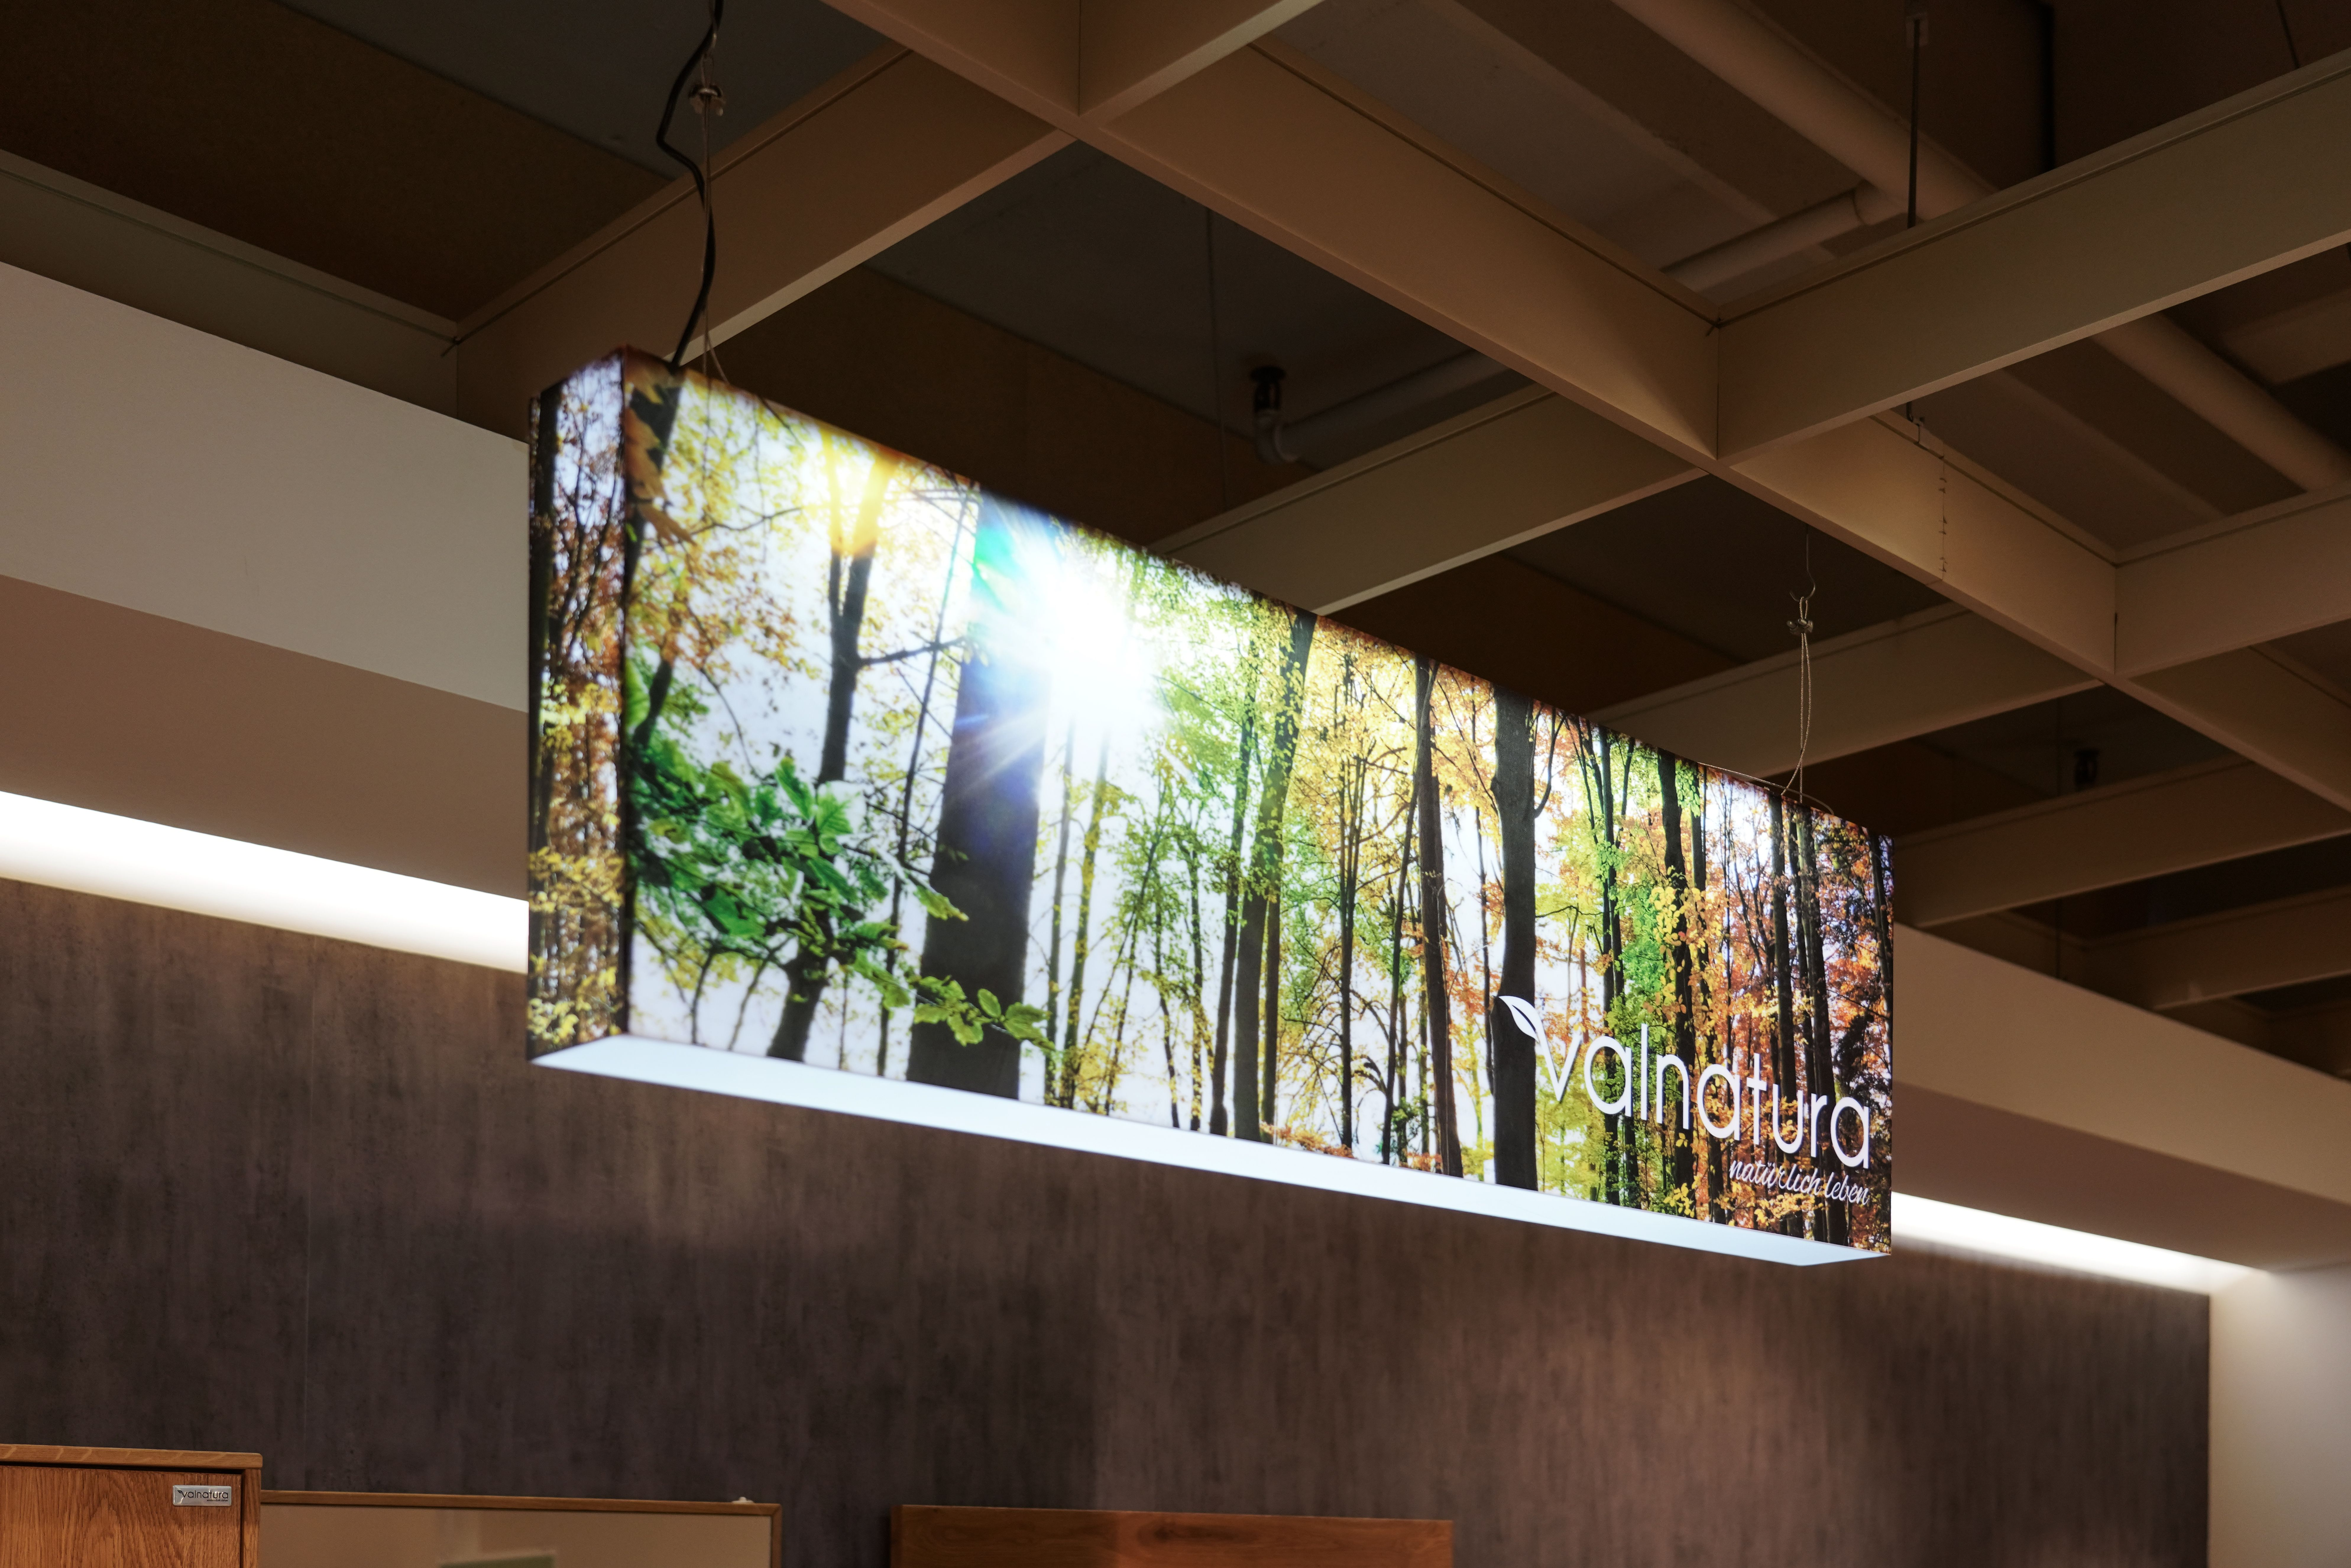 Led Plexiglas Image Led Beleuchtung Leuchten